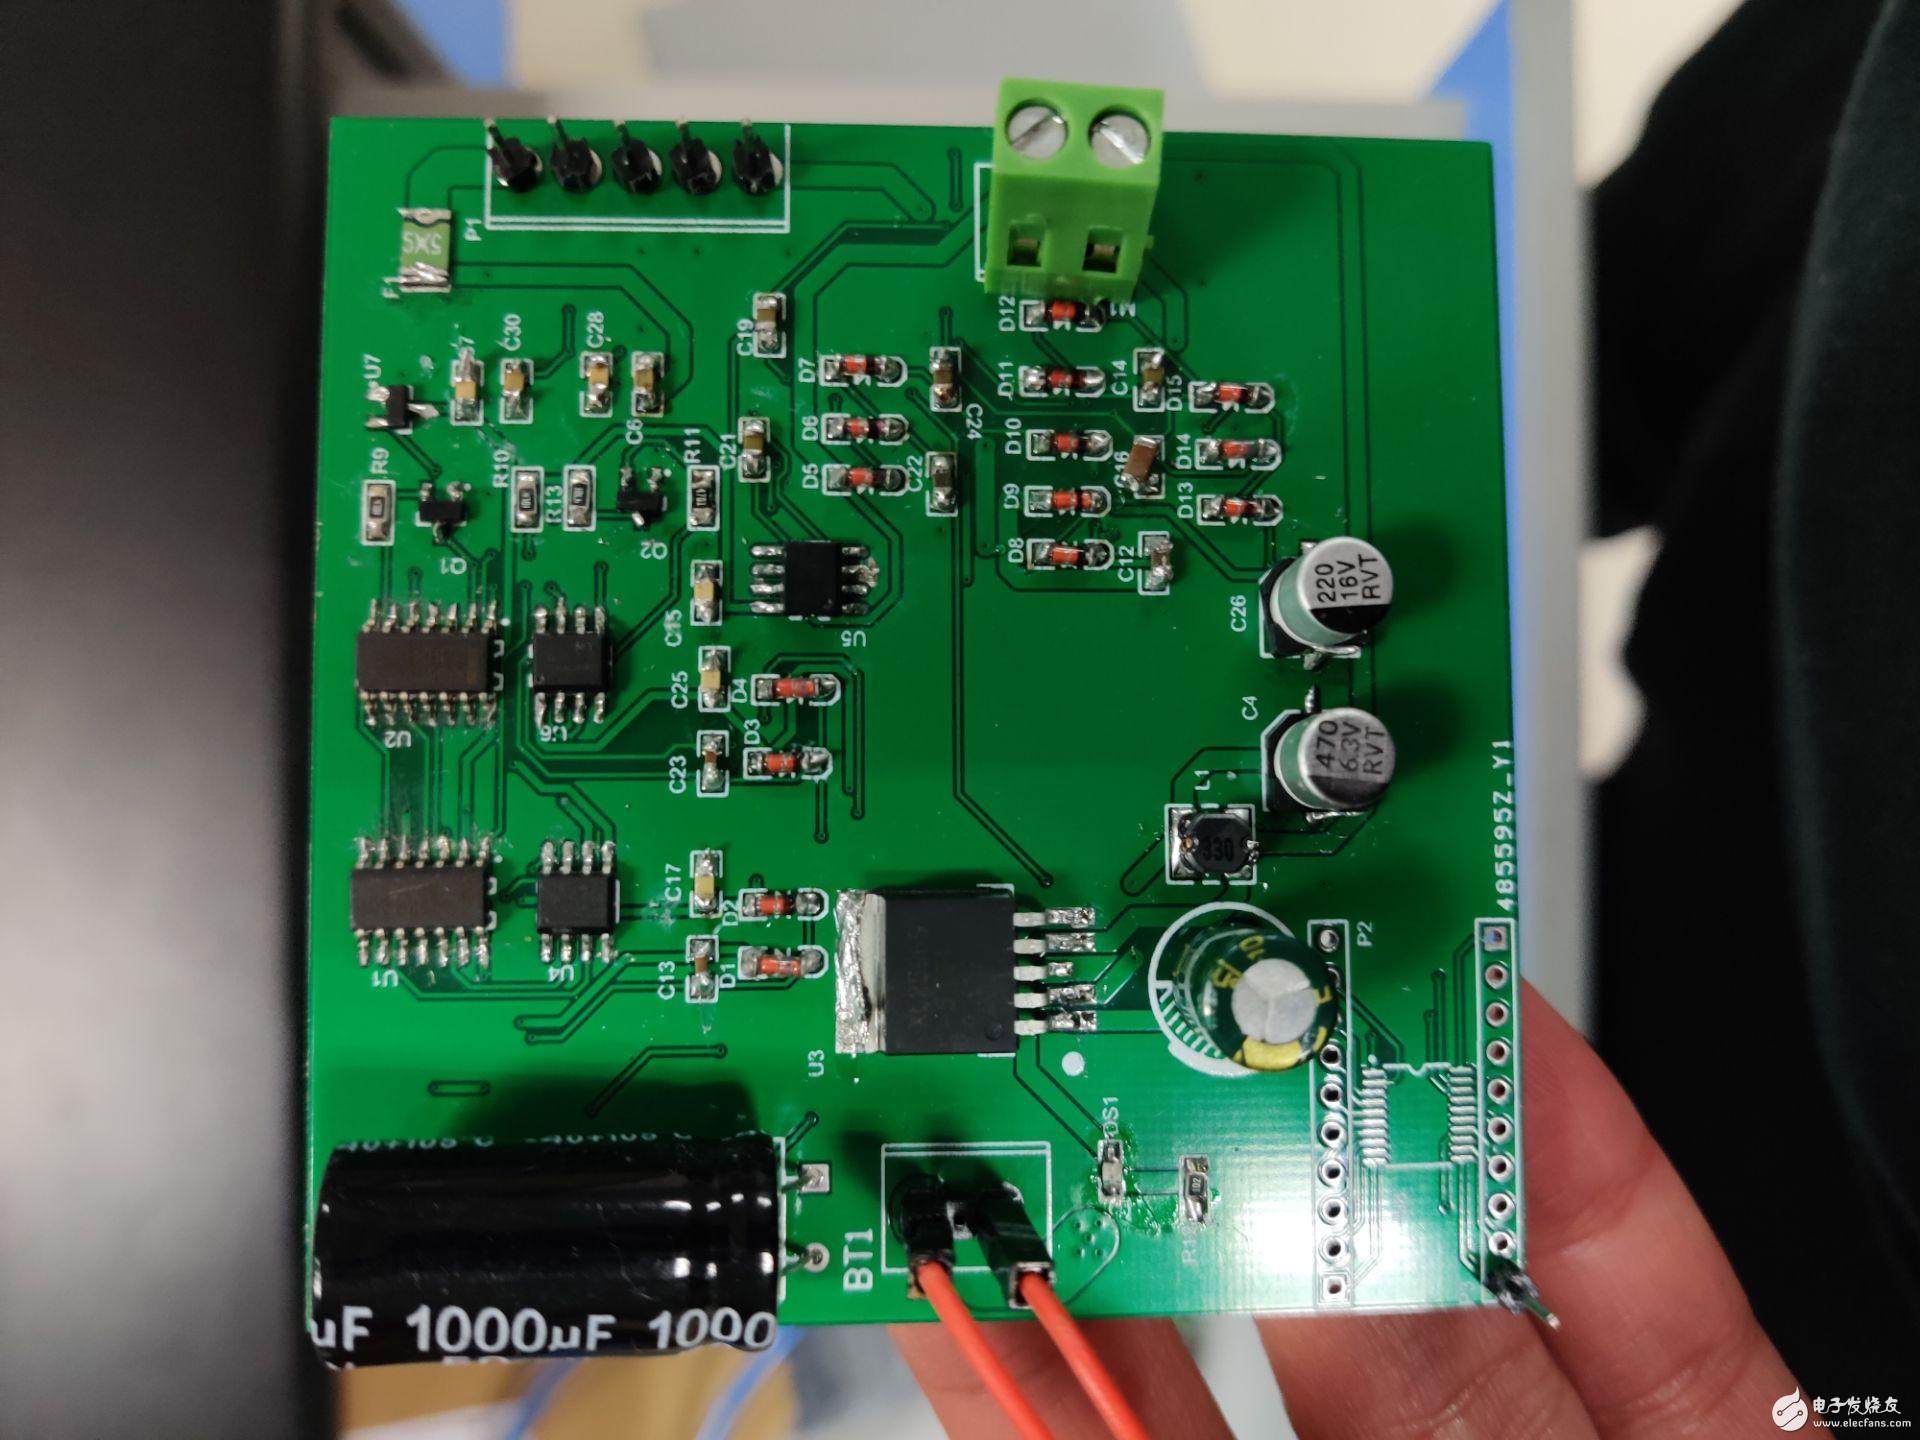 【PCB设计大赛】这是一个电机驱动模块,是一个抄板的模块